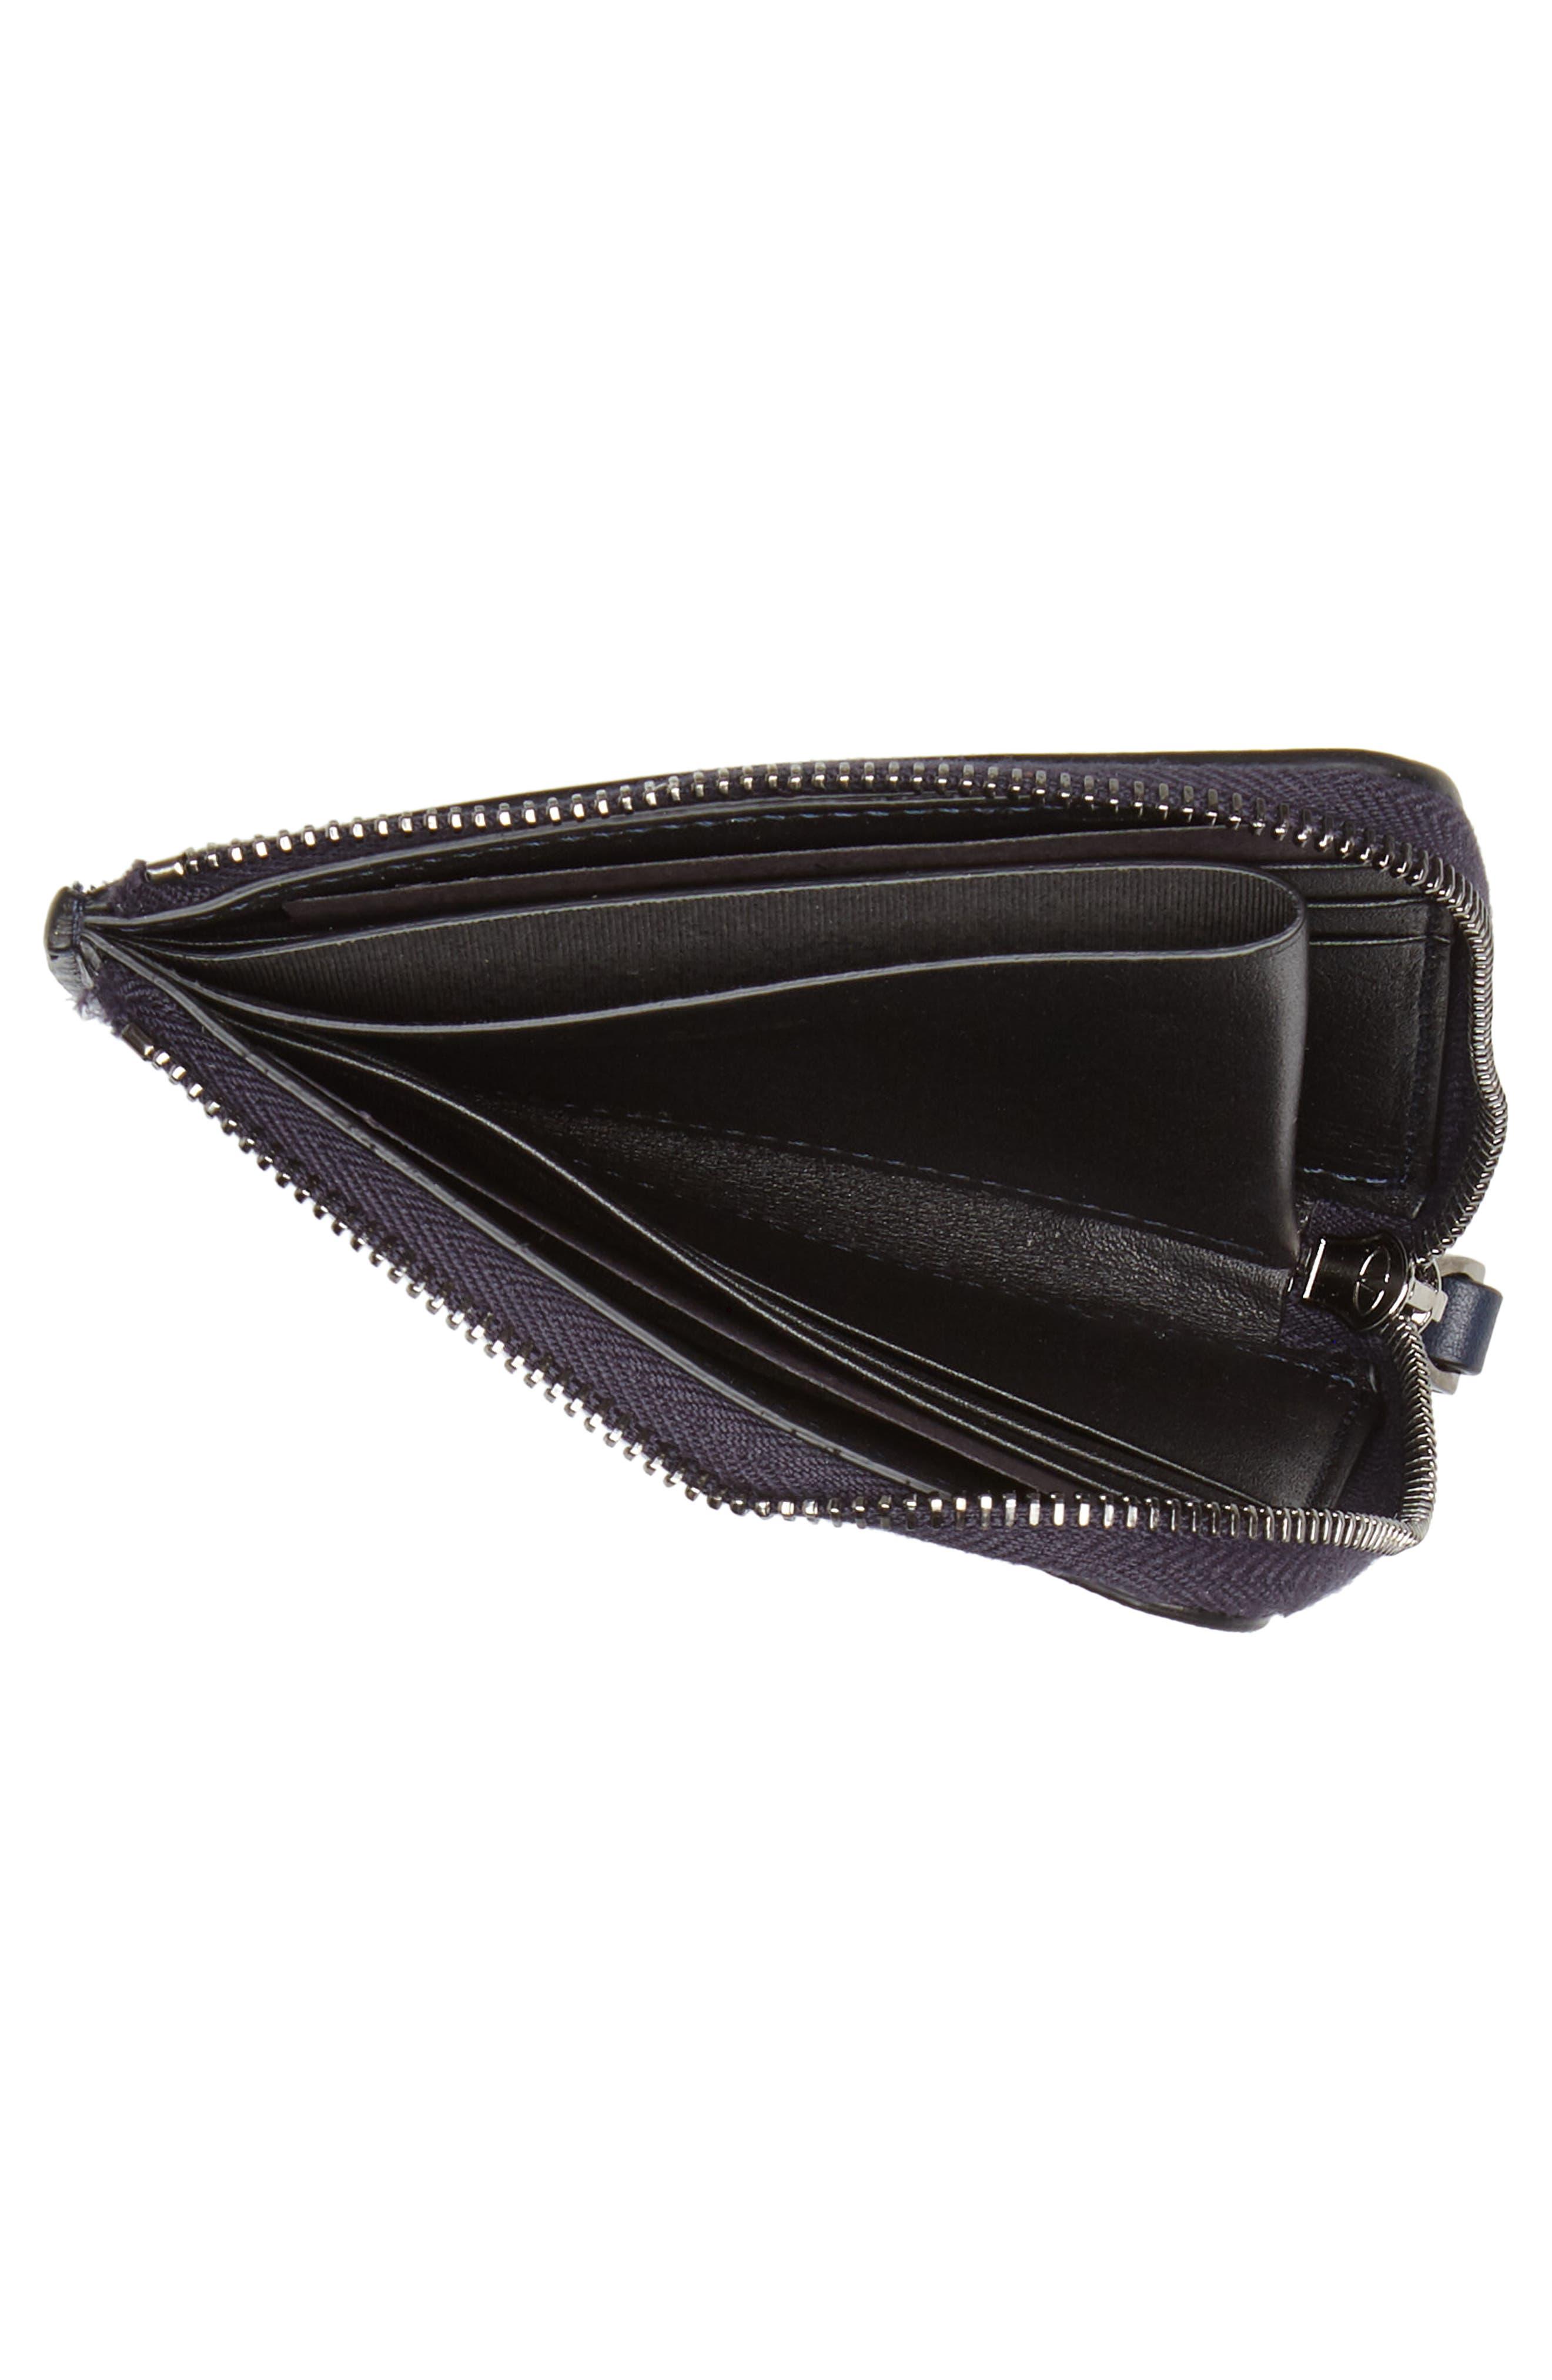 GARAVANI Camo Zip Wallet,                             Alternate thumbnail 2, color,                             MARINE